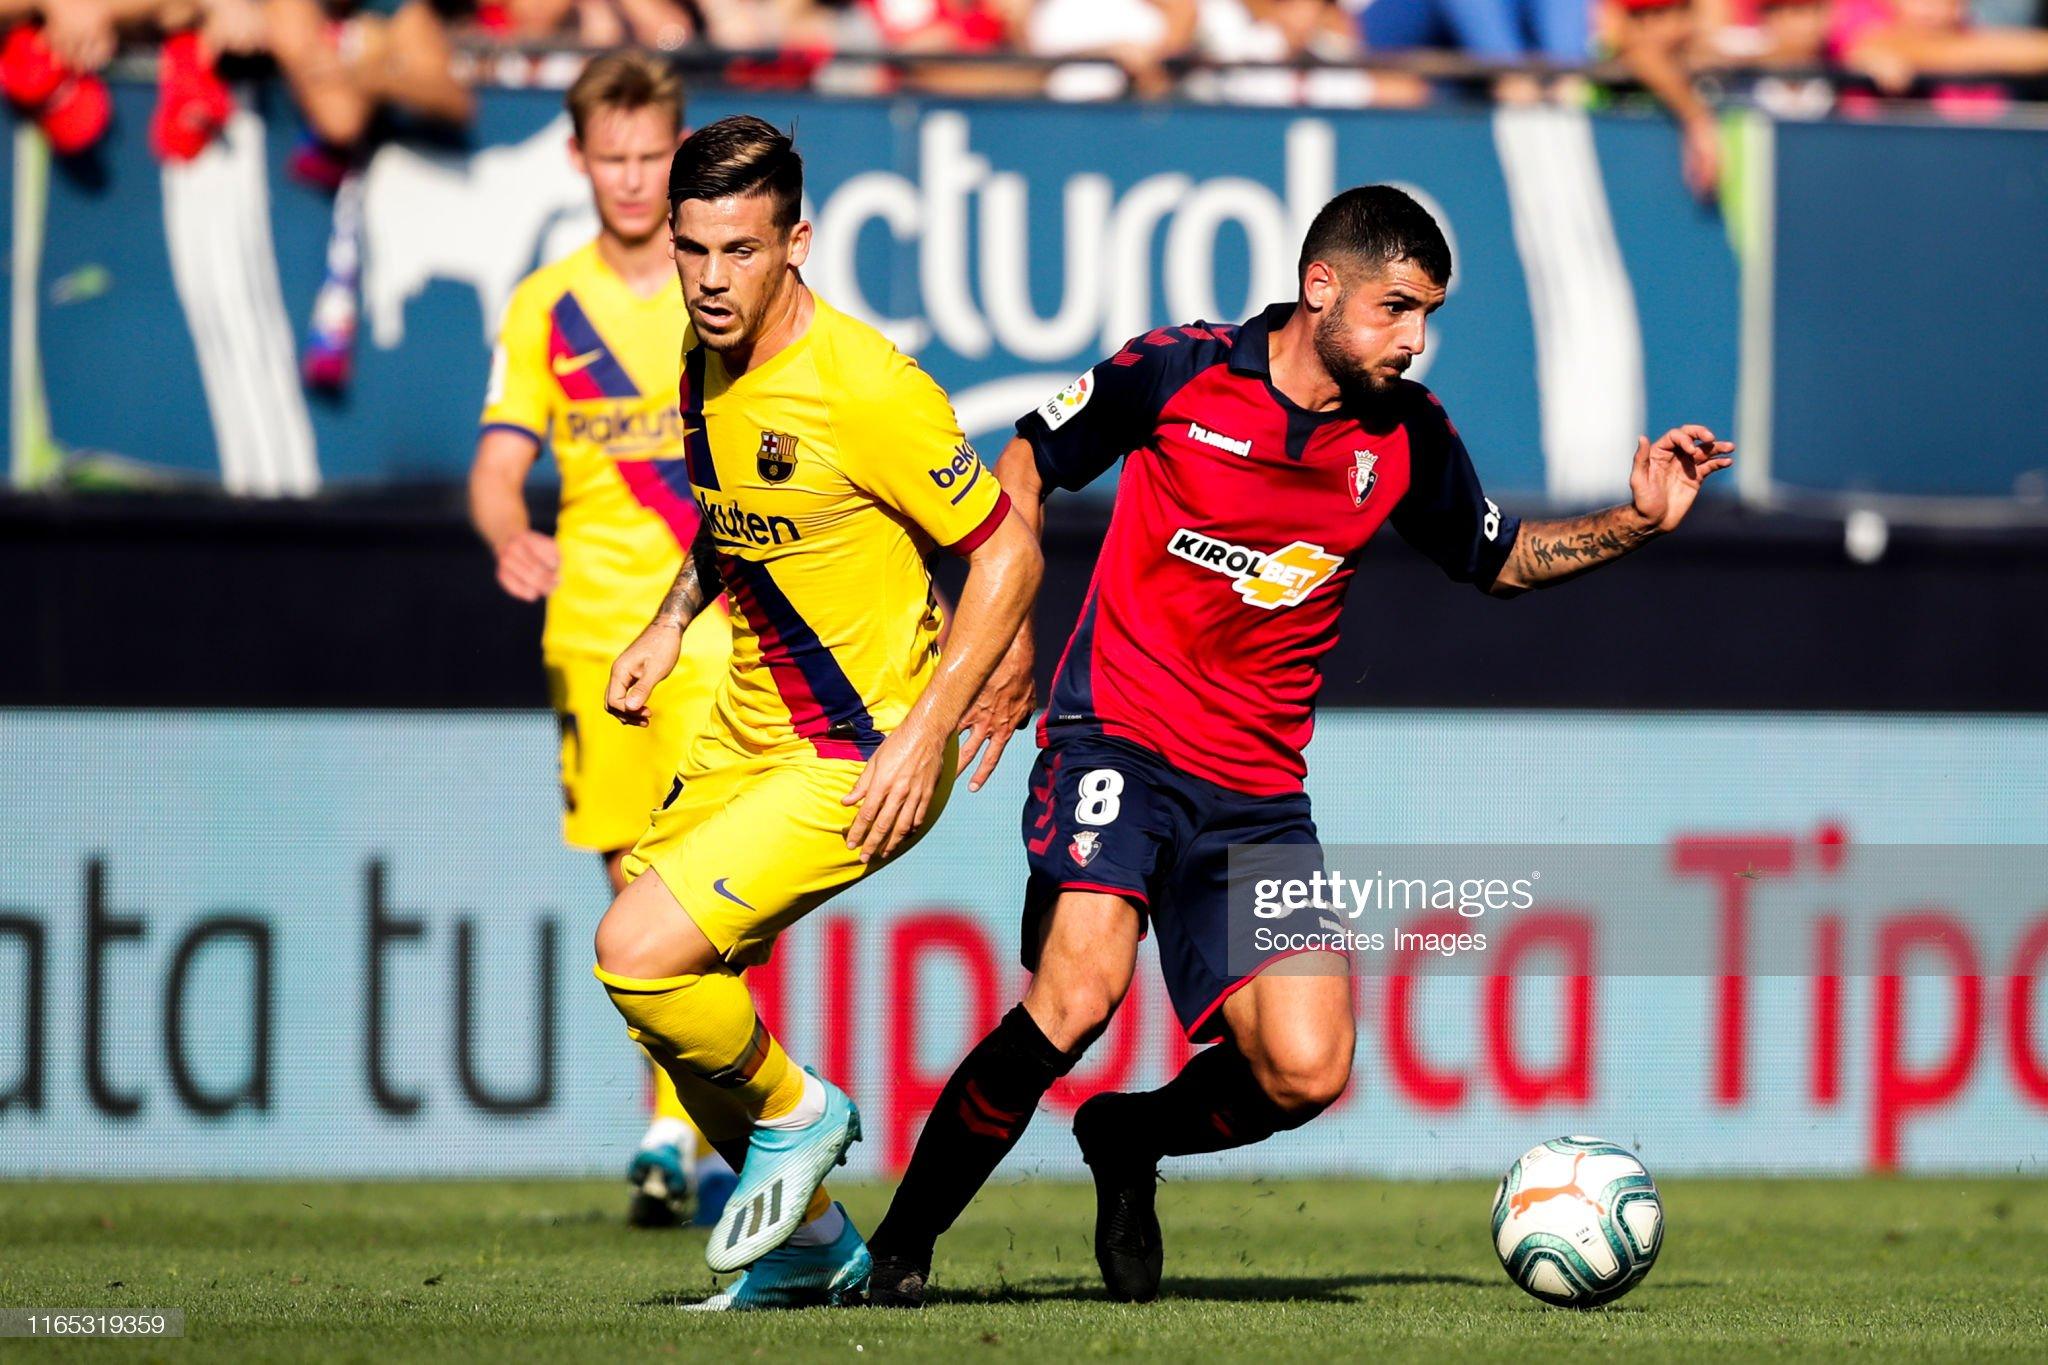 صور مباراة : أوساسونا - برشلونة 2-2 ( 31-08-2019 )  Carles-perez-of-fc-barcelona-fran-merida-of-ca-osasuna-during-the-la-picture-id1165319359?s=2048x2048